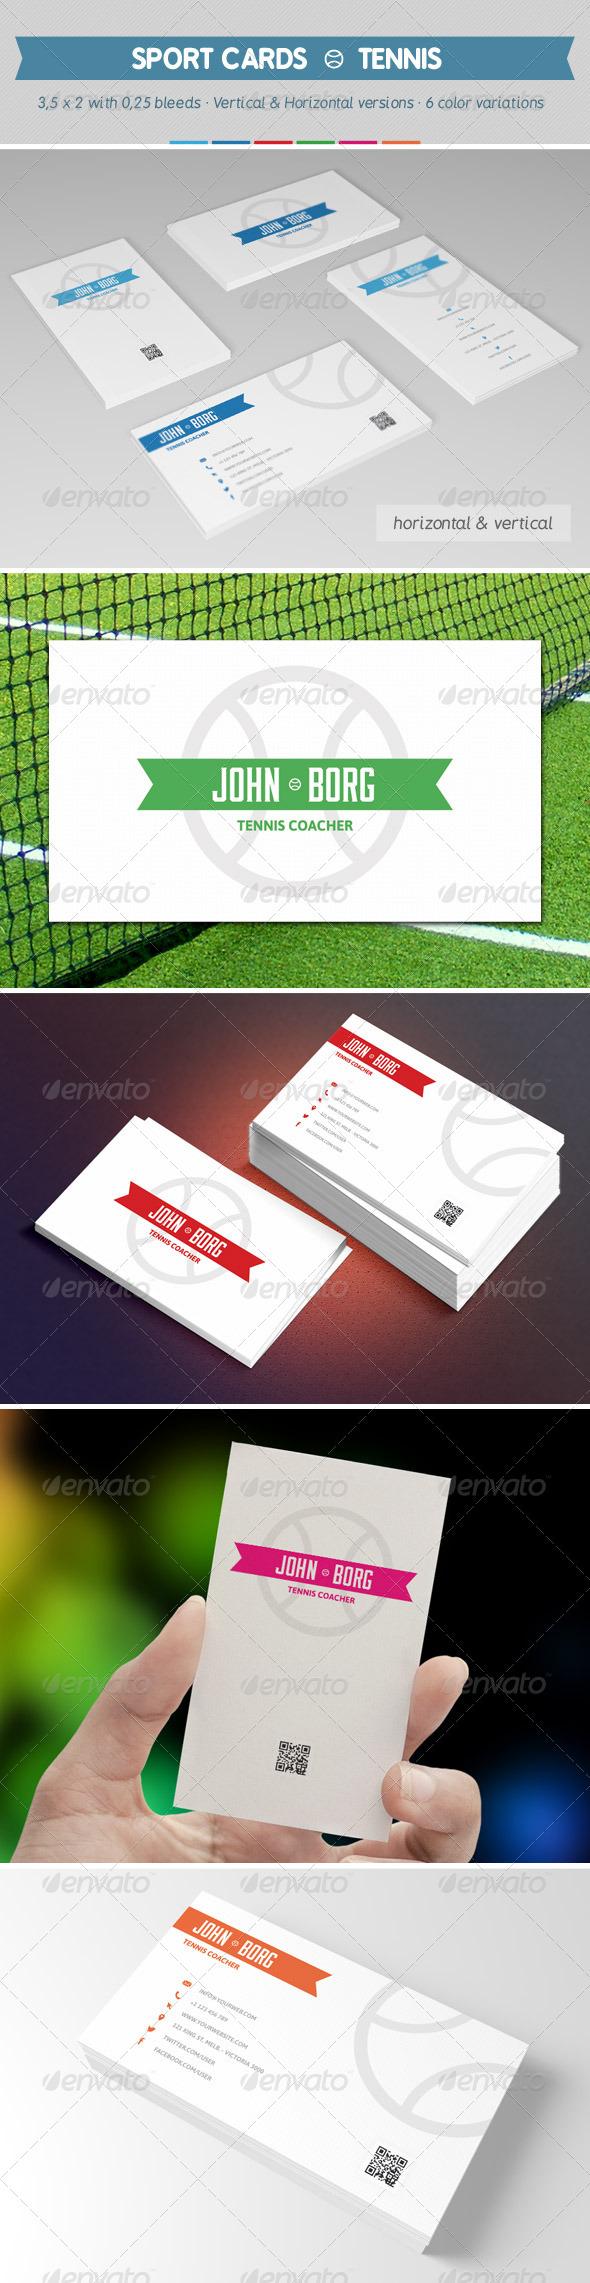 Sport Business Card Graphics, Designs & Templates